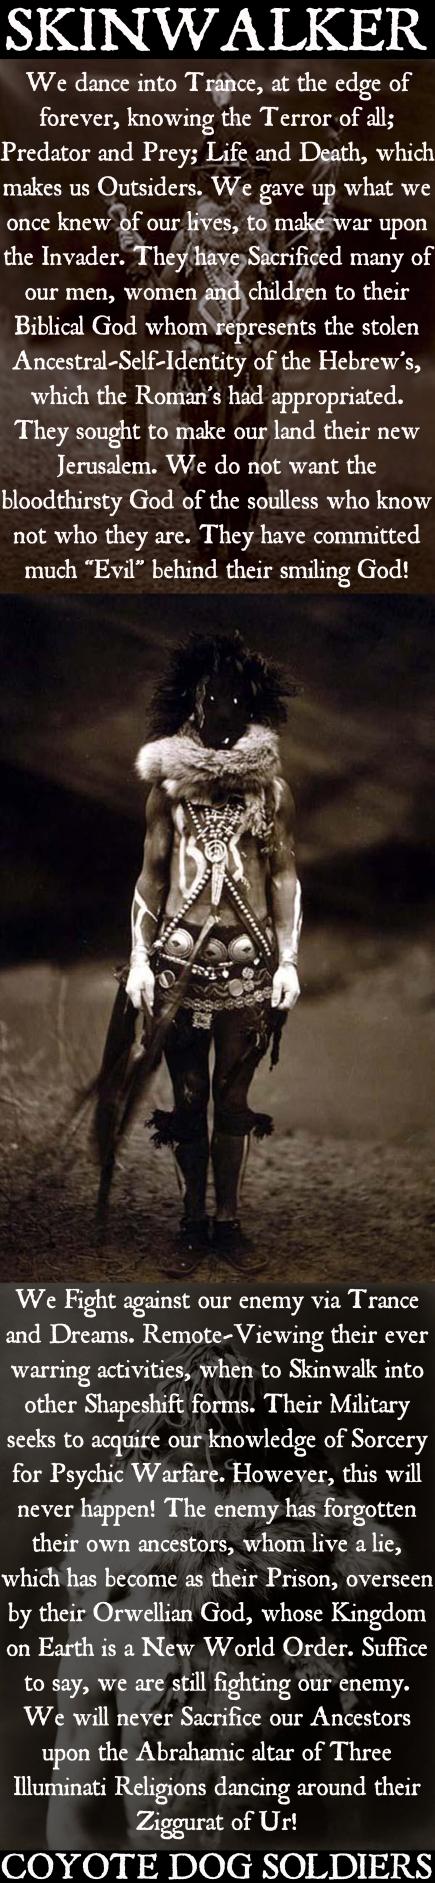 skinwalker_sorcerer_shaman_wizard_dog_soldier_berserker_coyote_werewolf